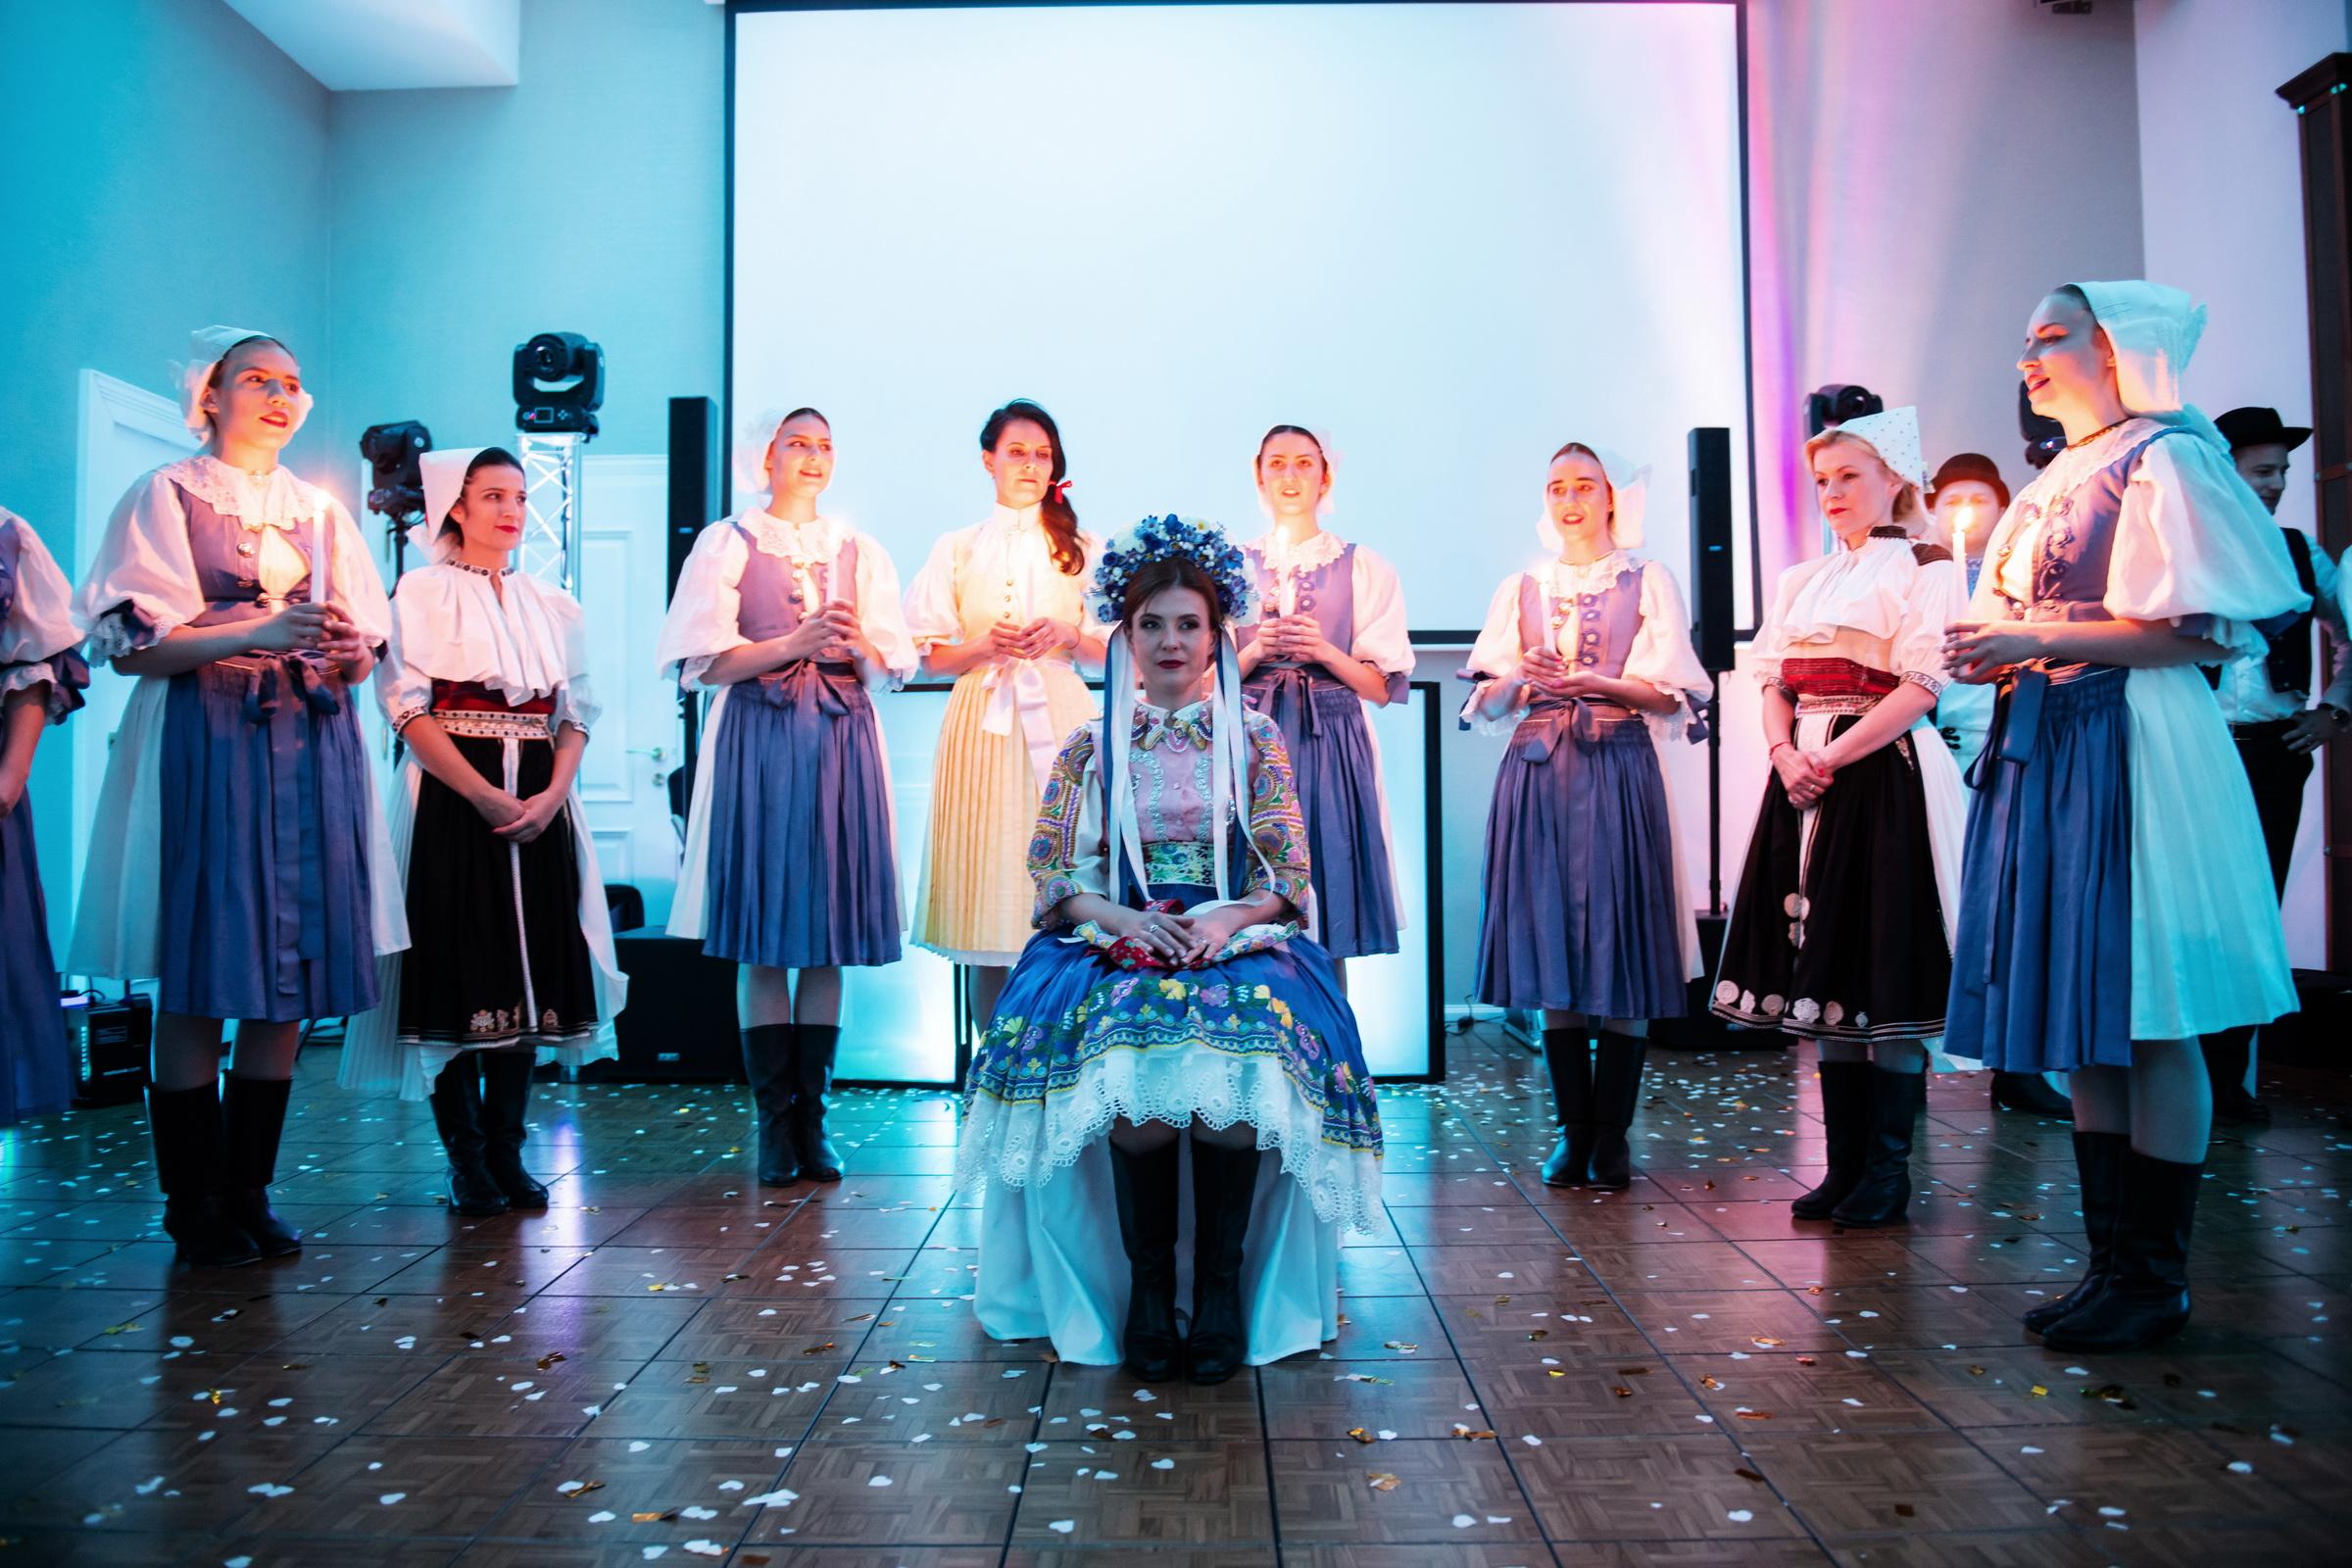 Svadba Hotel Elizabeth, Trenčín 04, #svadobnyDJ, #djanasvadbu, #svadba, #hotelelizabeth